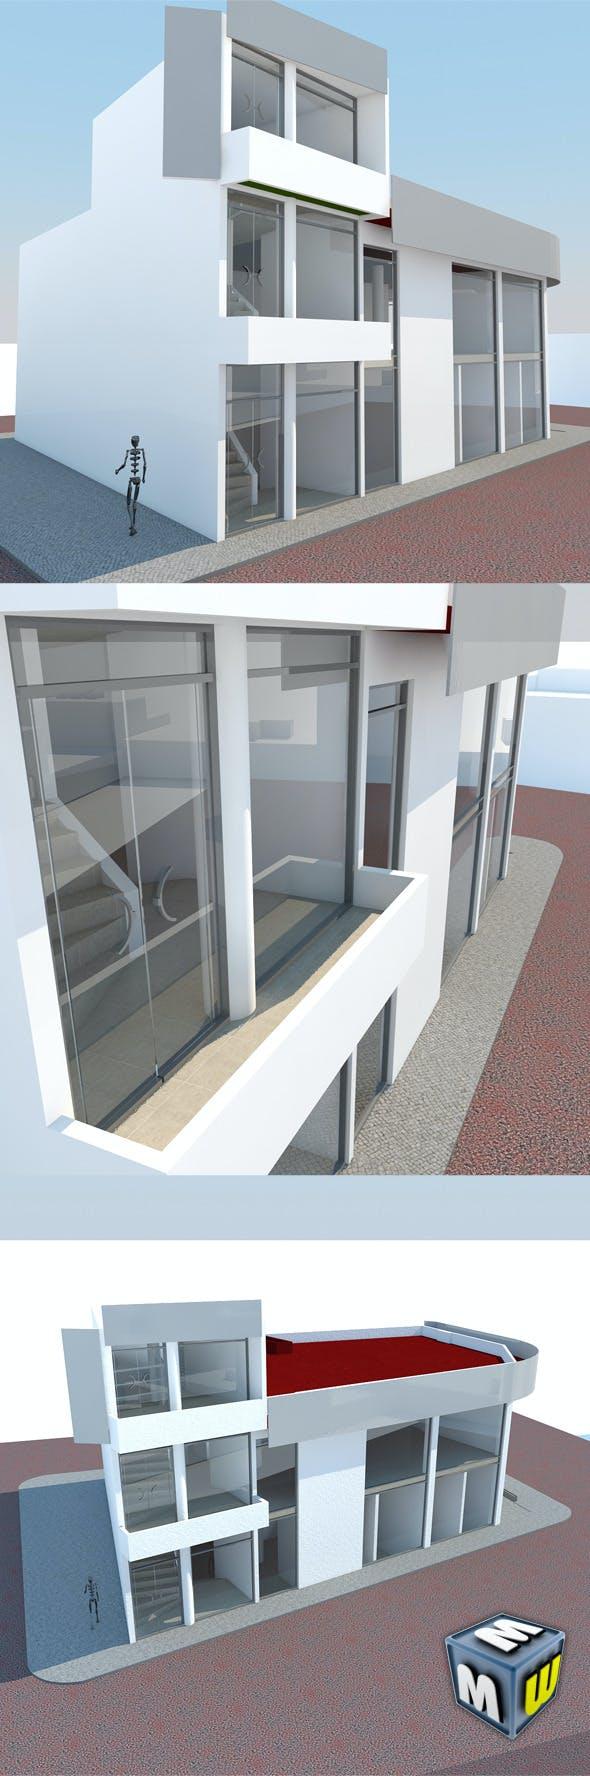 Building Commerce Max 2011 - 3DOcean Item for Sale